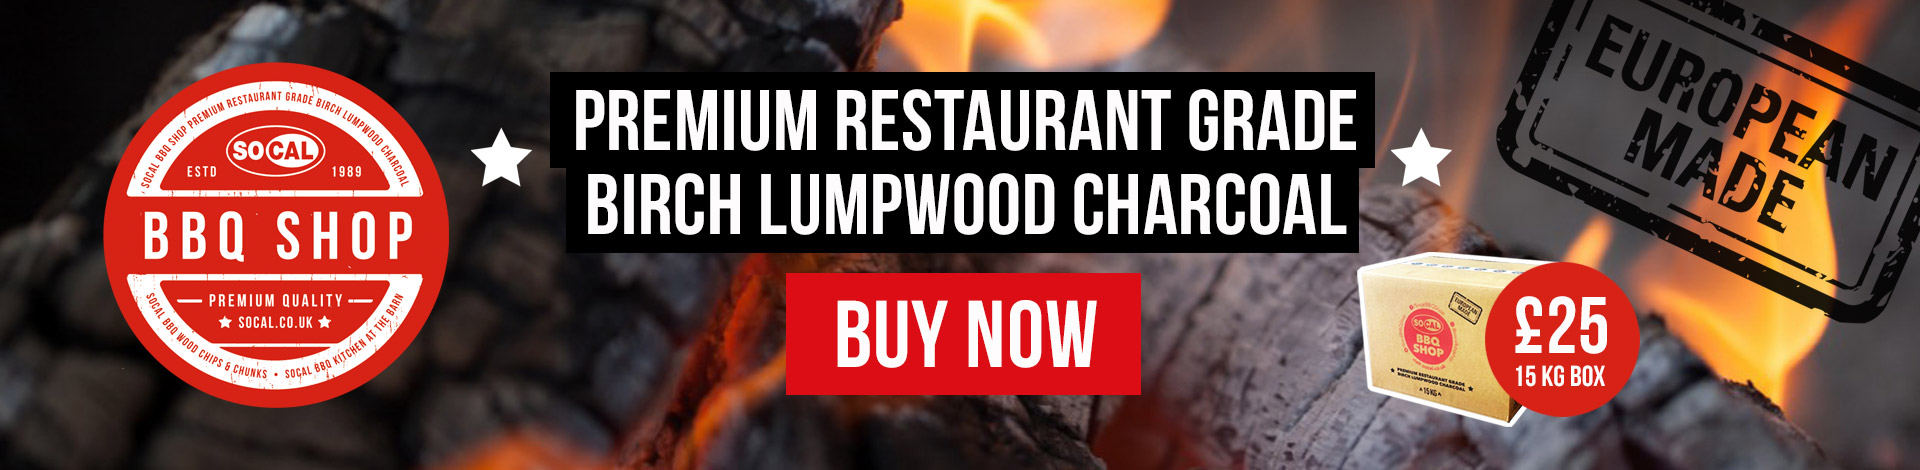 BBQ shop premium charcoal buy now